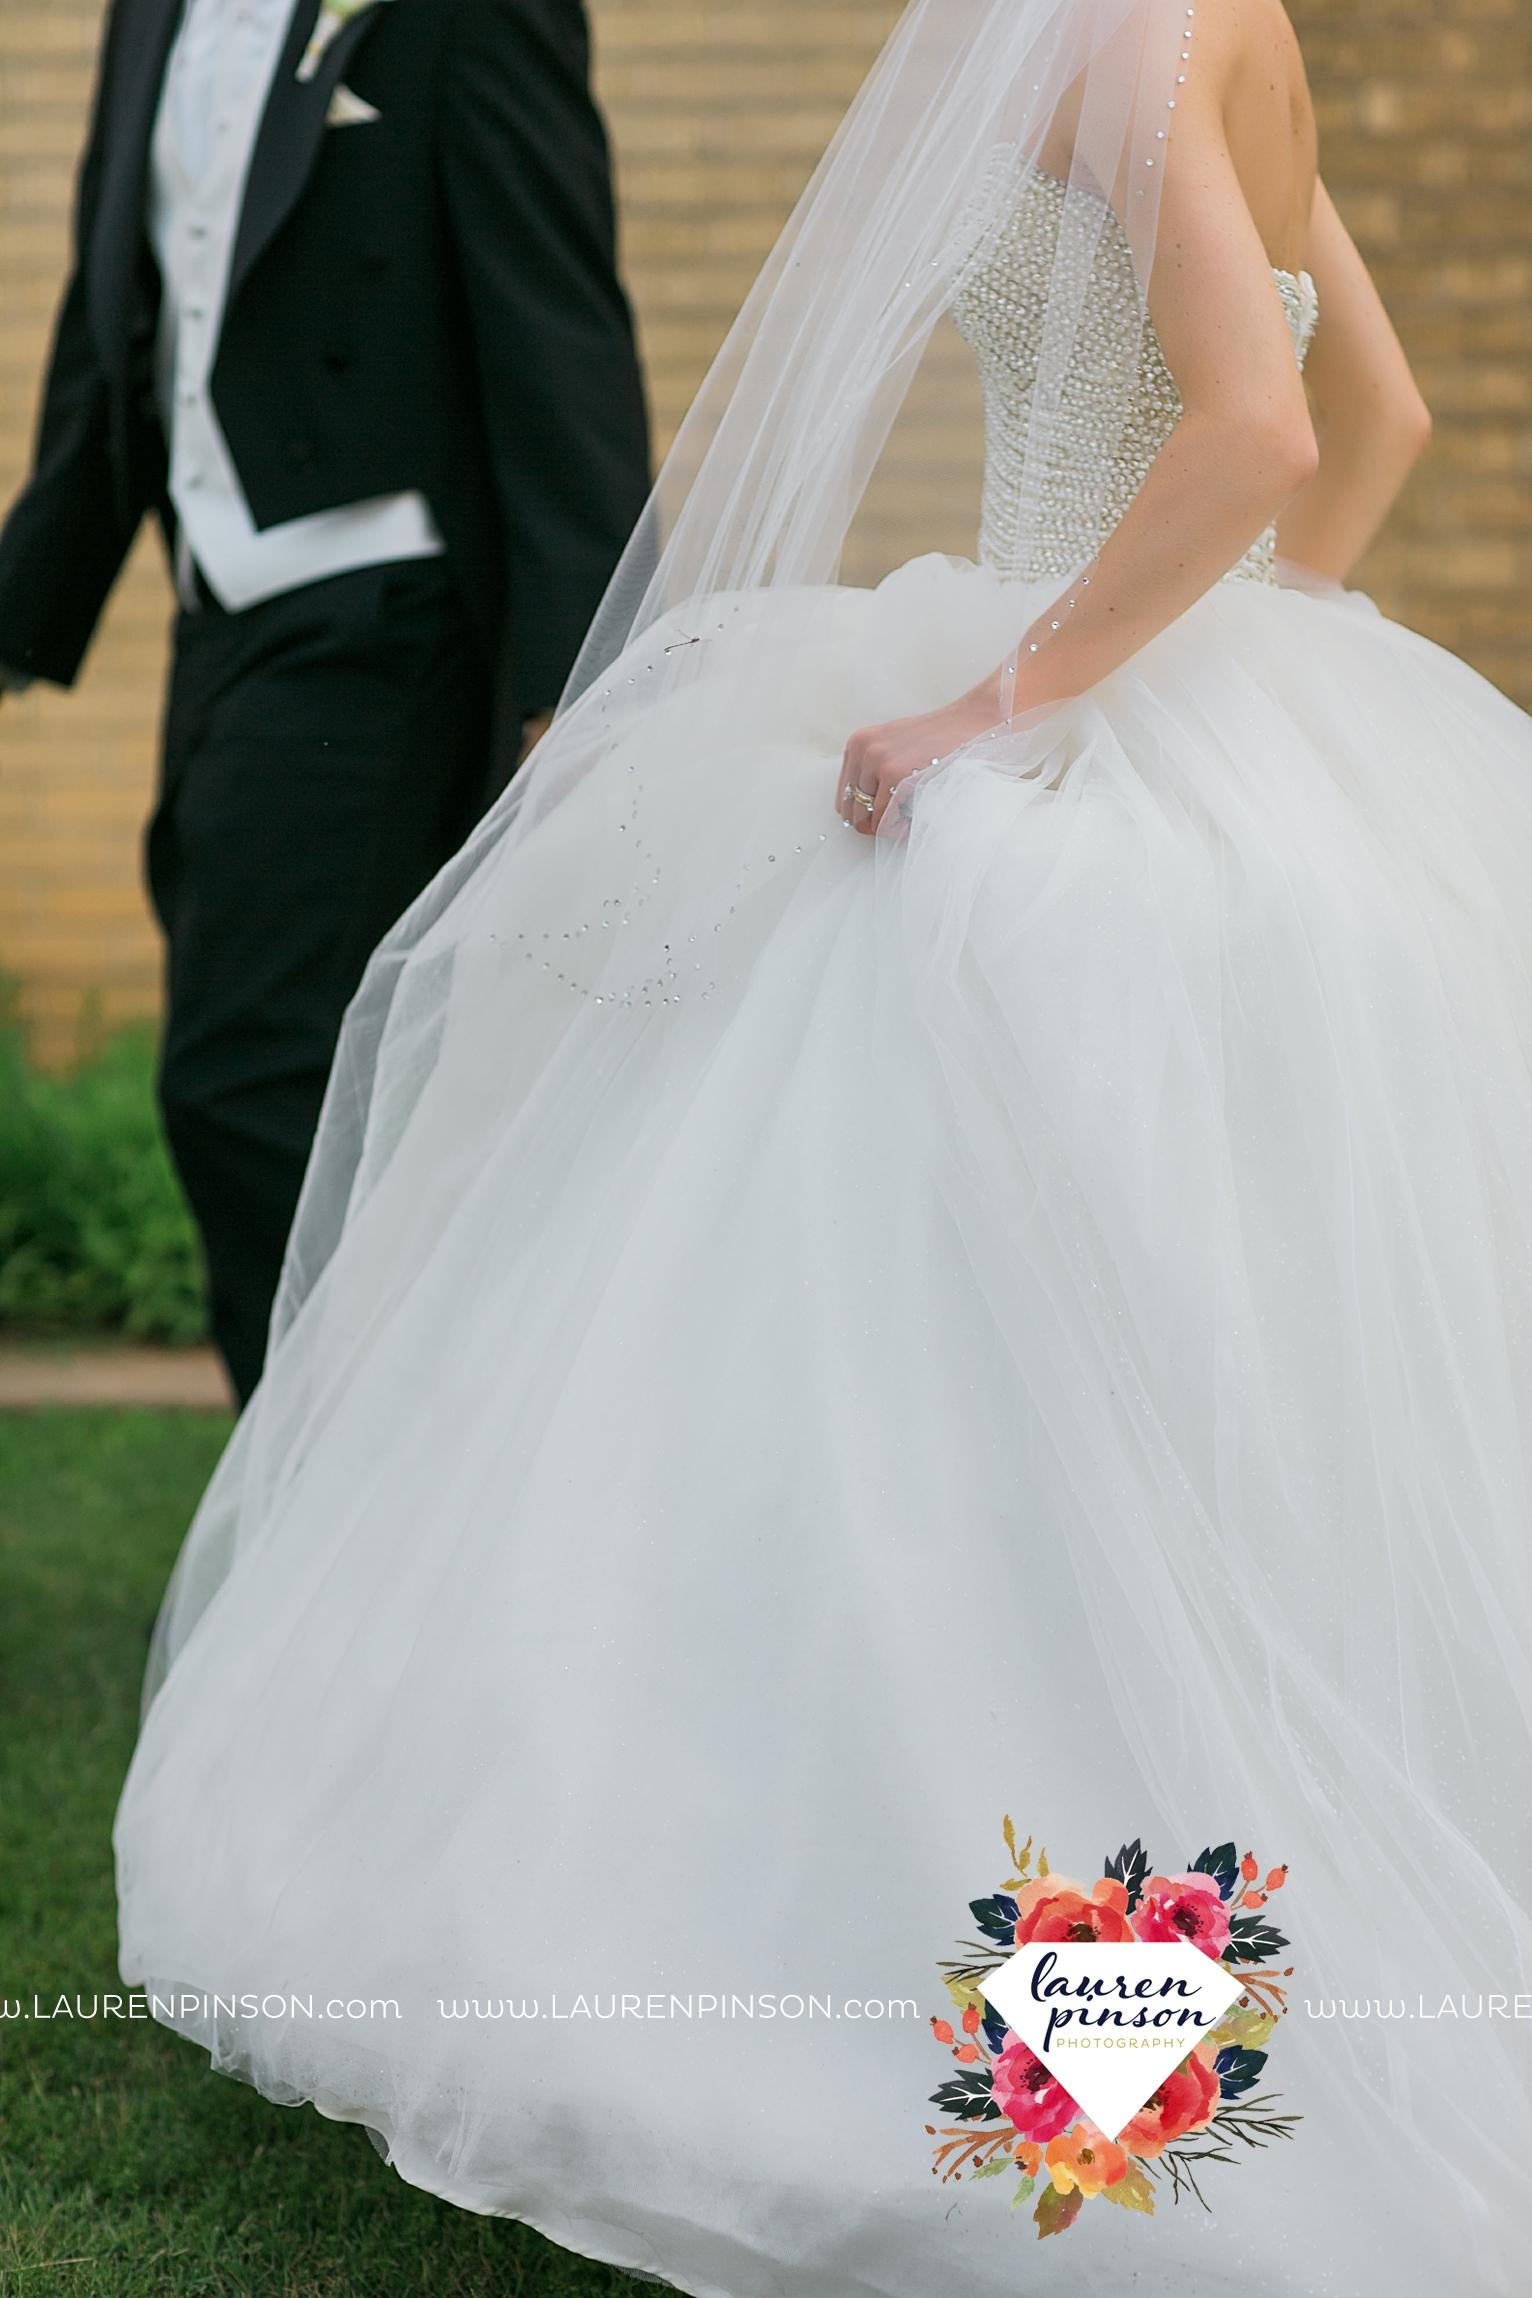 wichita-falls-texas-wedding-photographer-the-forum-by-the-kemp-mayfield-events-ulta-gold-glitter_2835.jpg